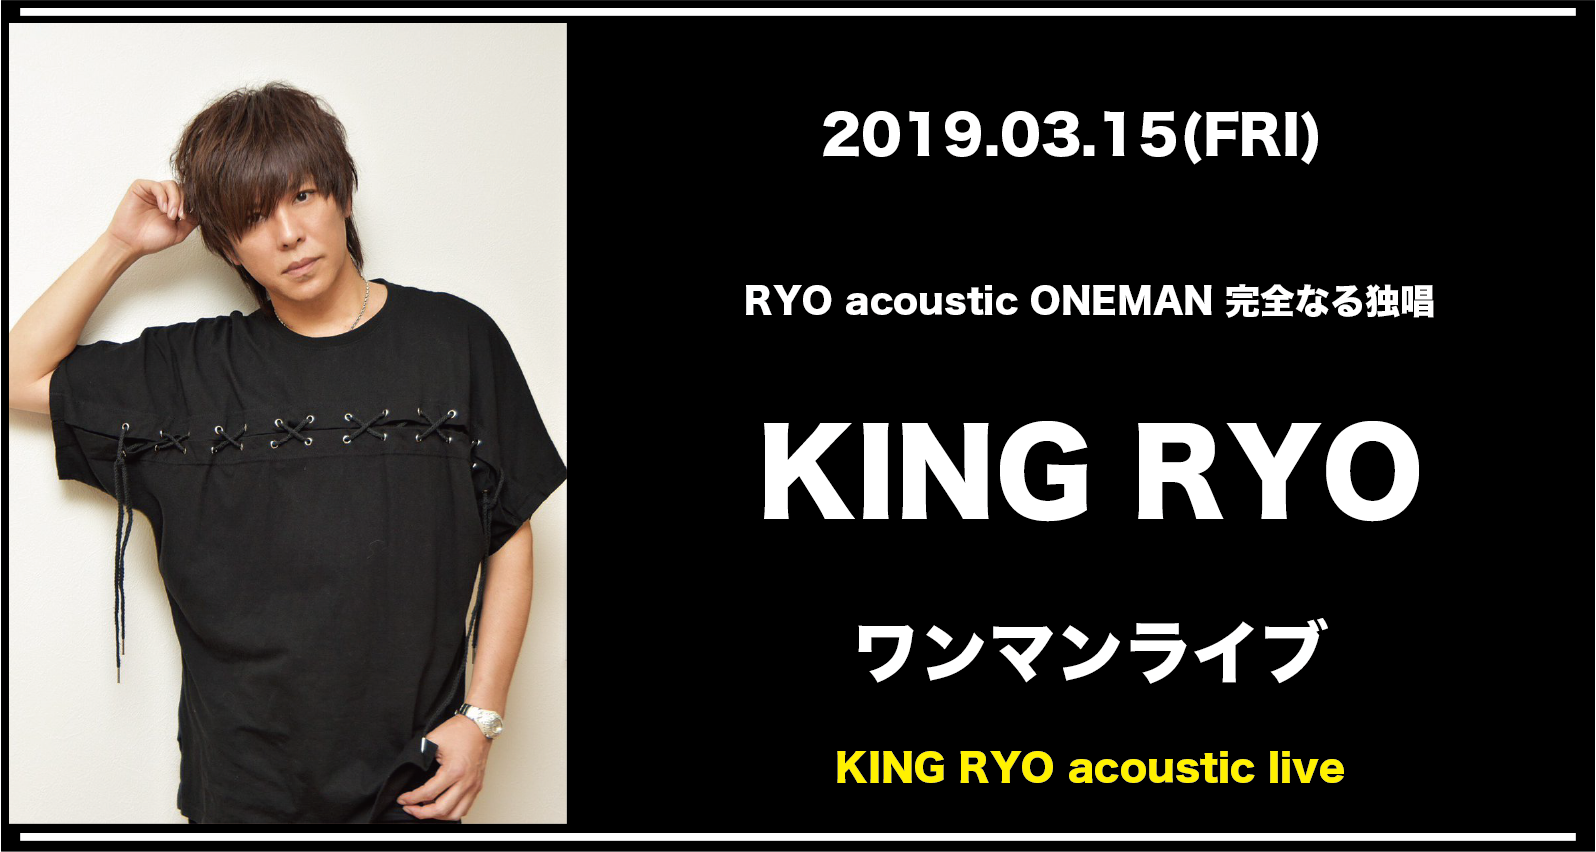 RYO acoustic ONEMAN 完全なる独唱